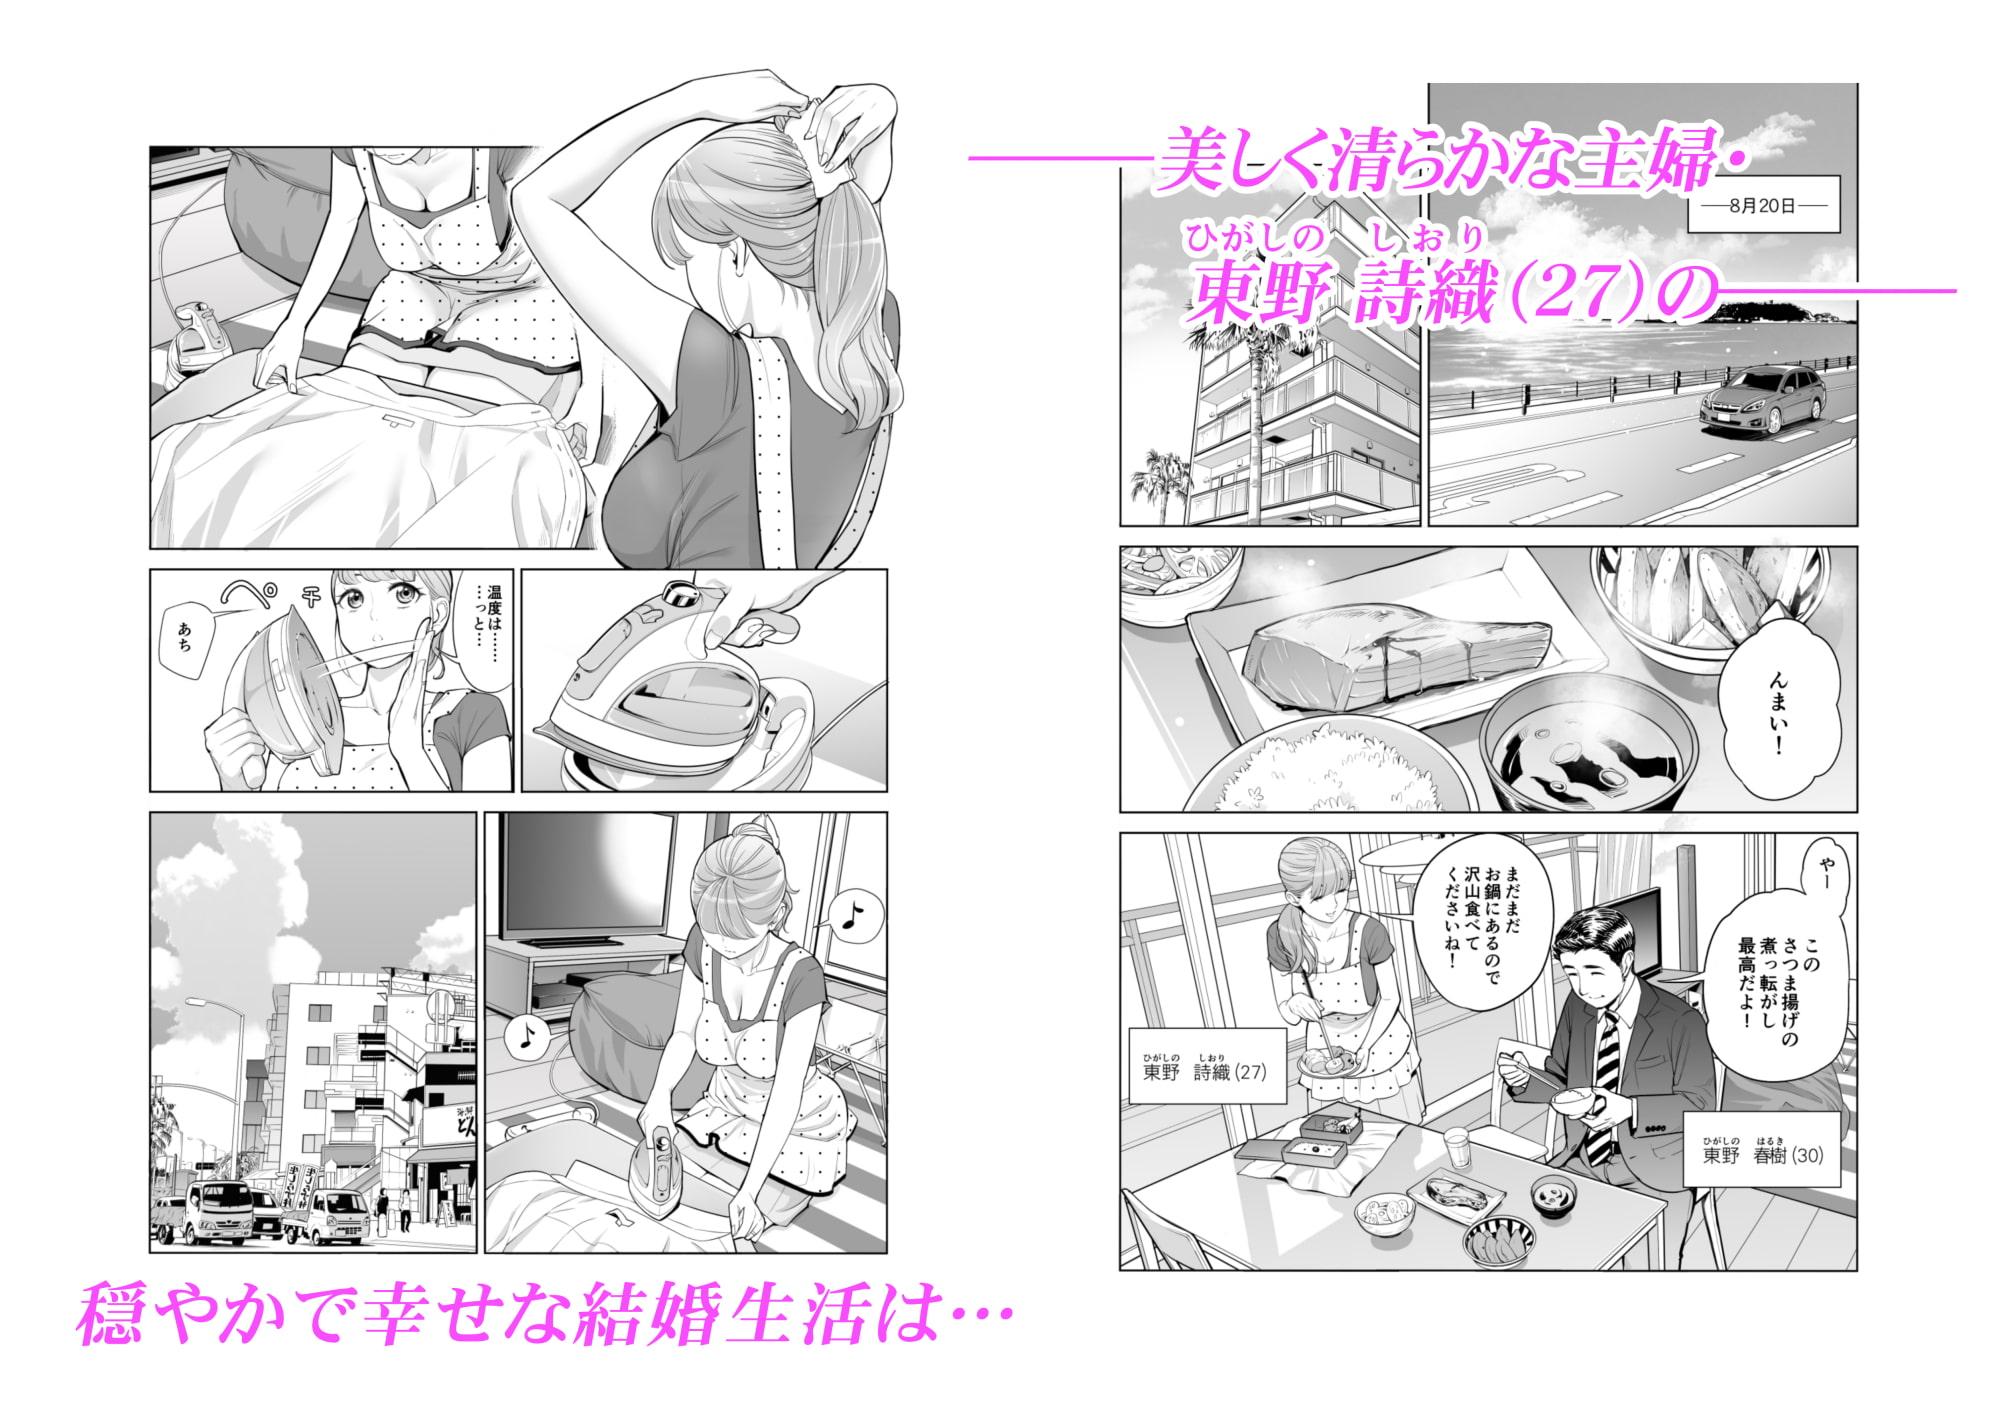 RJ329641 茜色に染まる若妻 ~病室で僕の妻が寝取られた~(合冊版) [20210605]